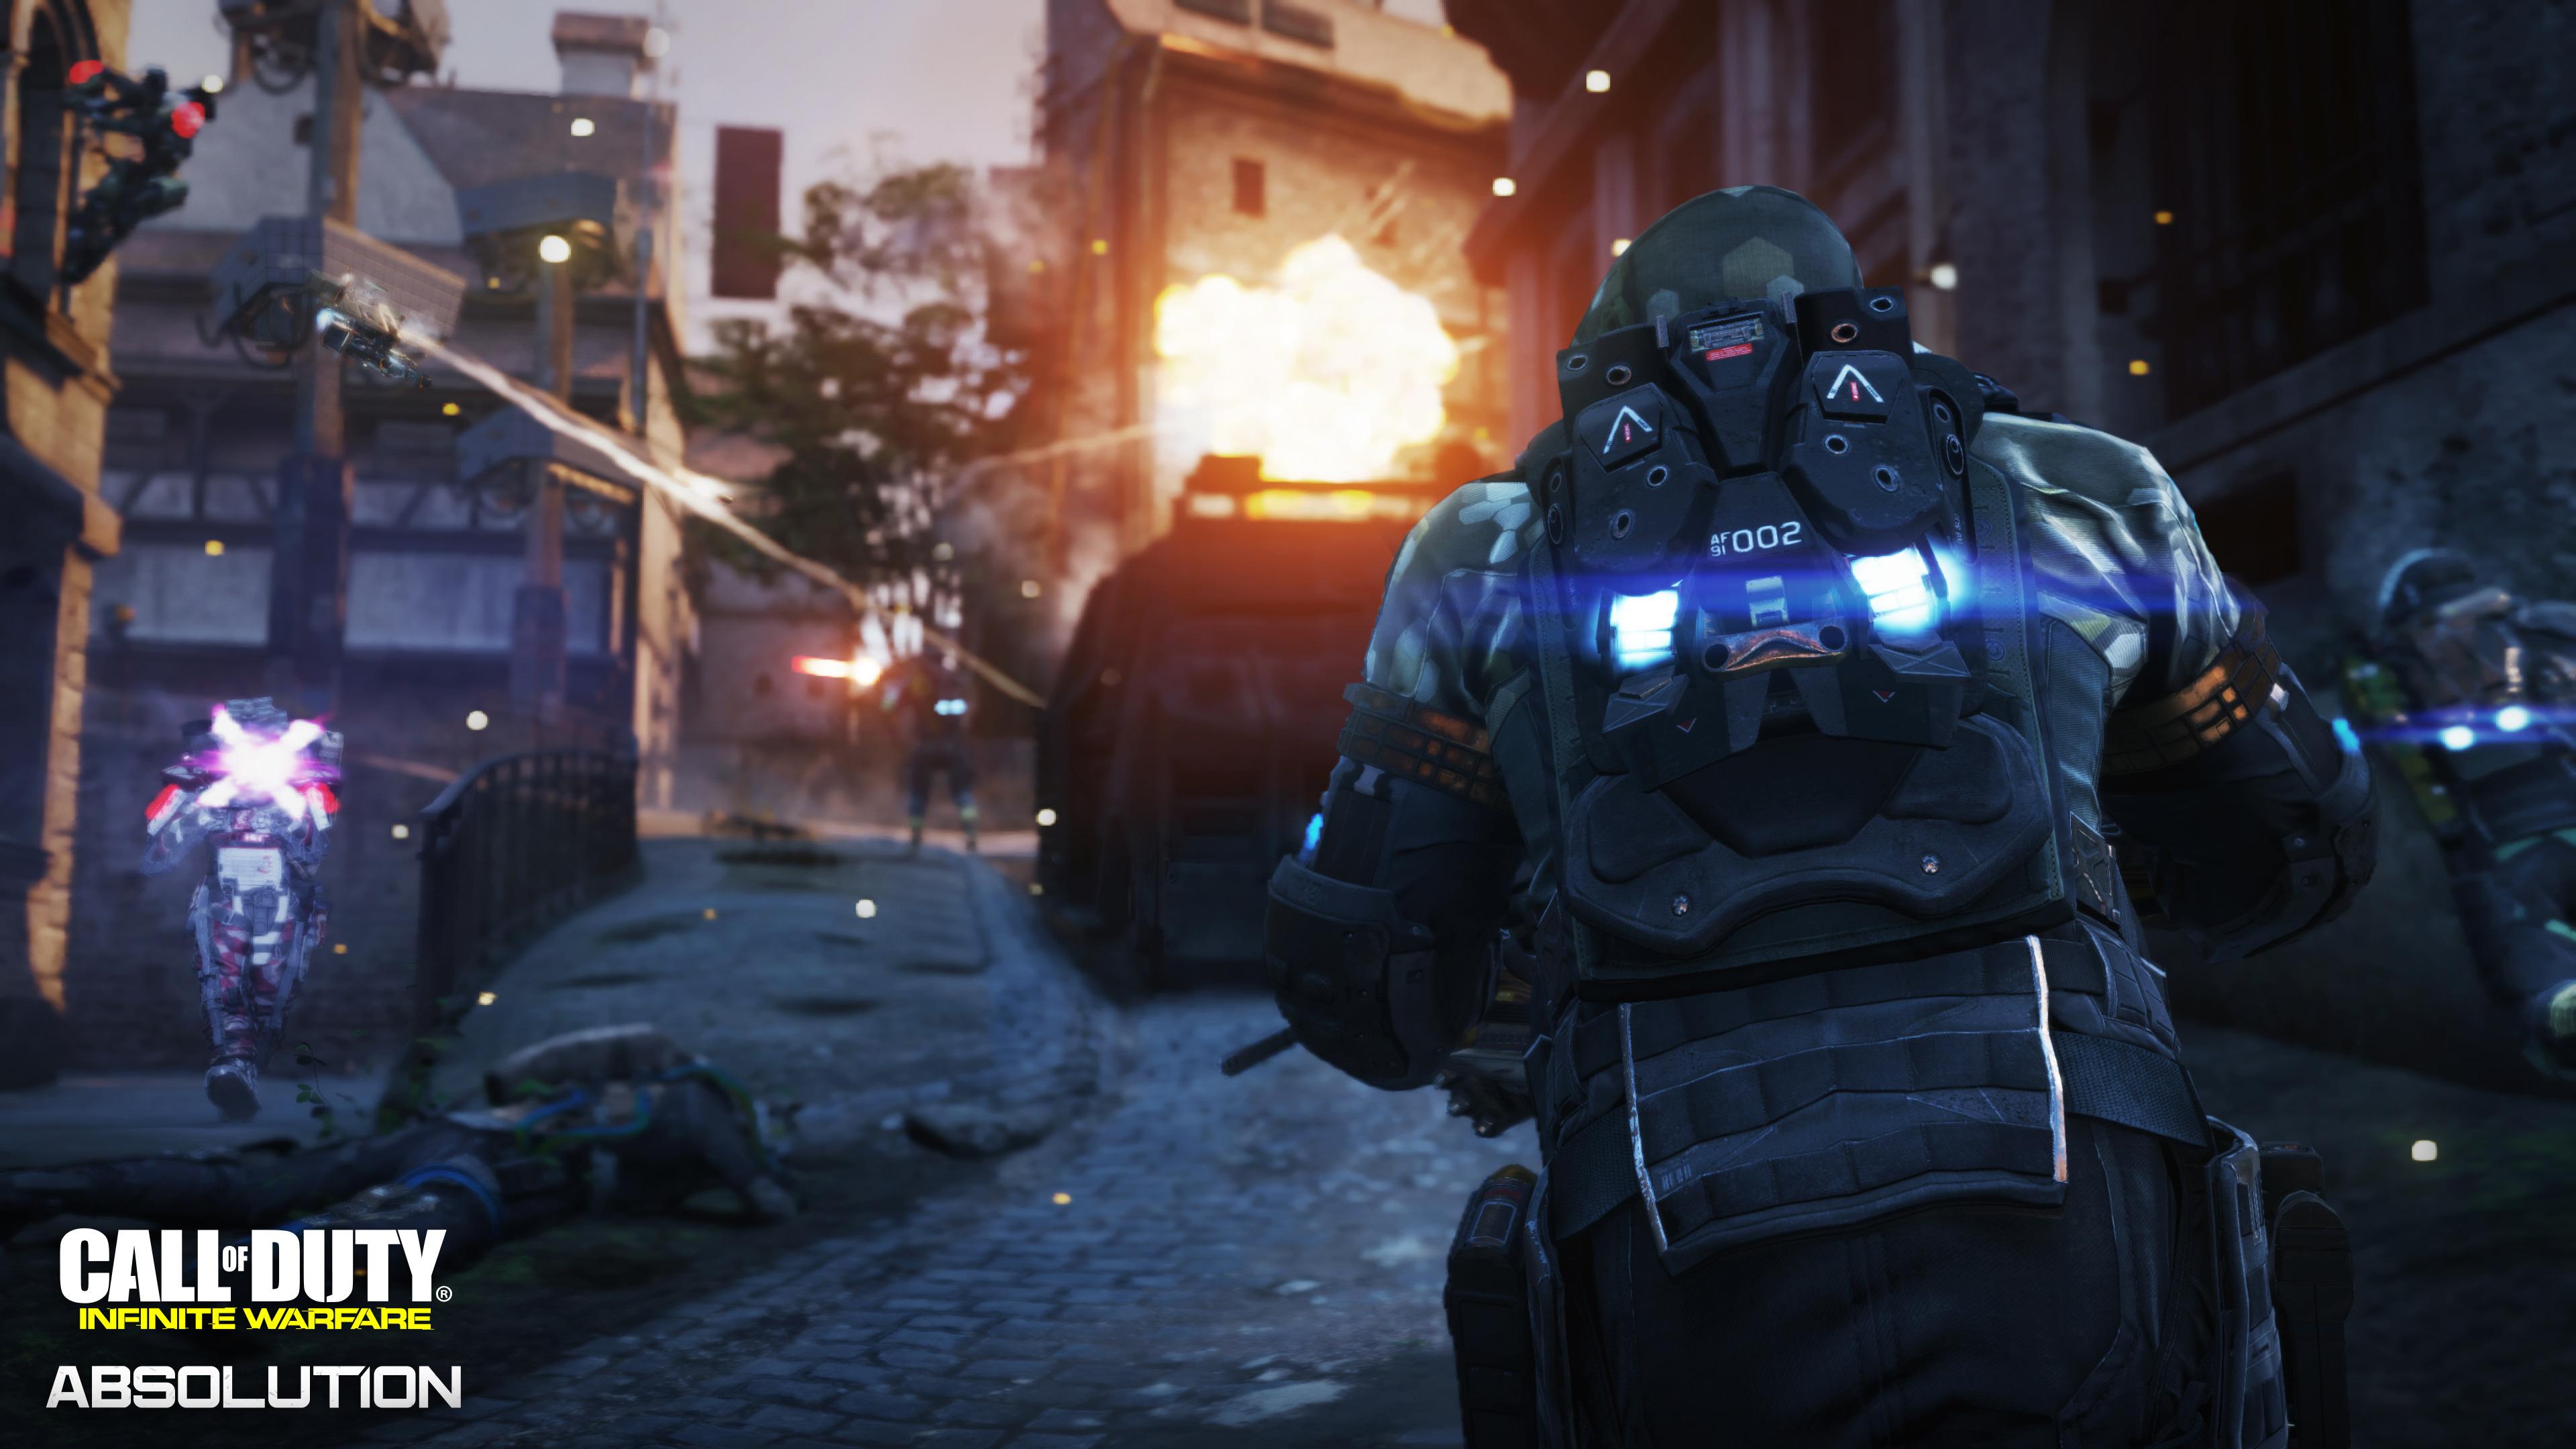 Call Of Duty Infinite Warfare Absolution Dlc3 2017 Hd Games 4k